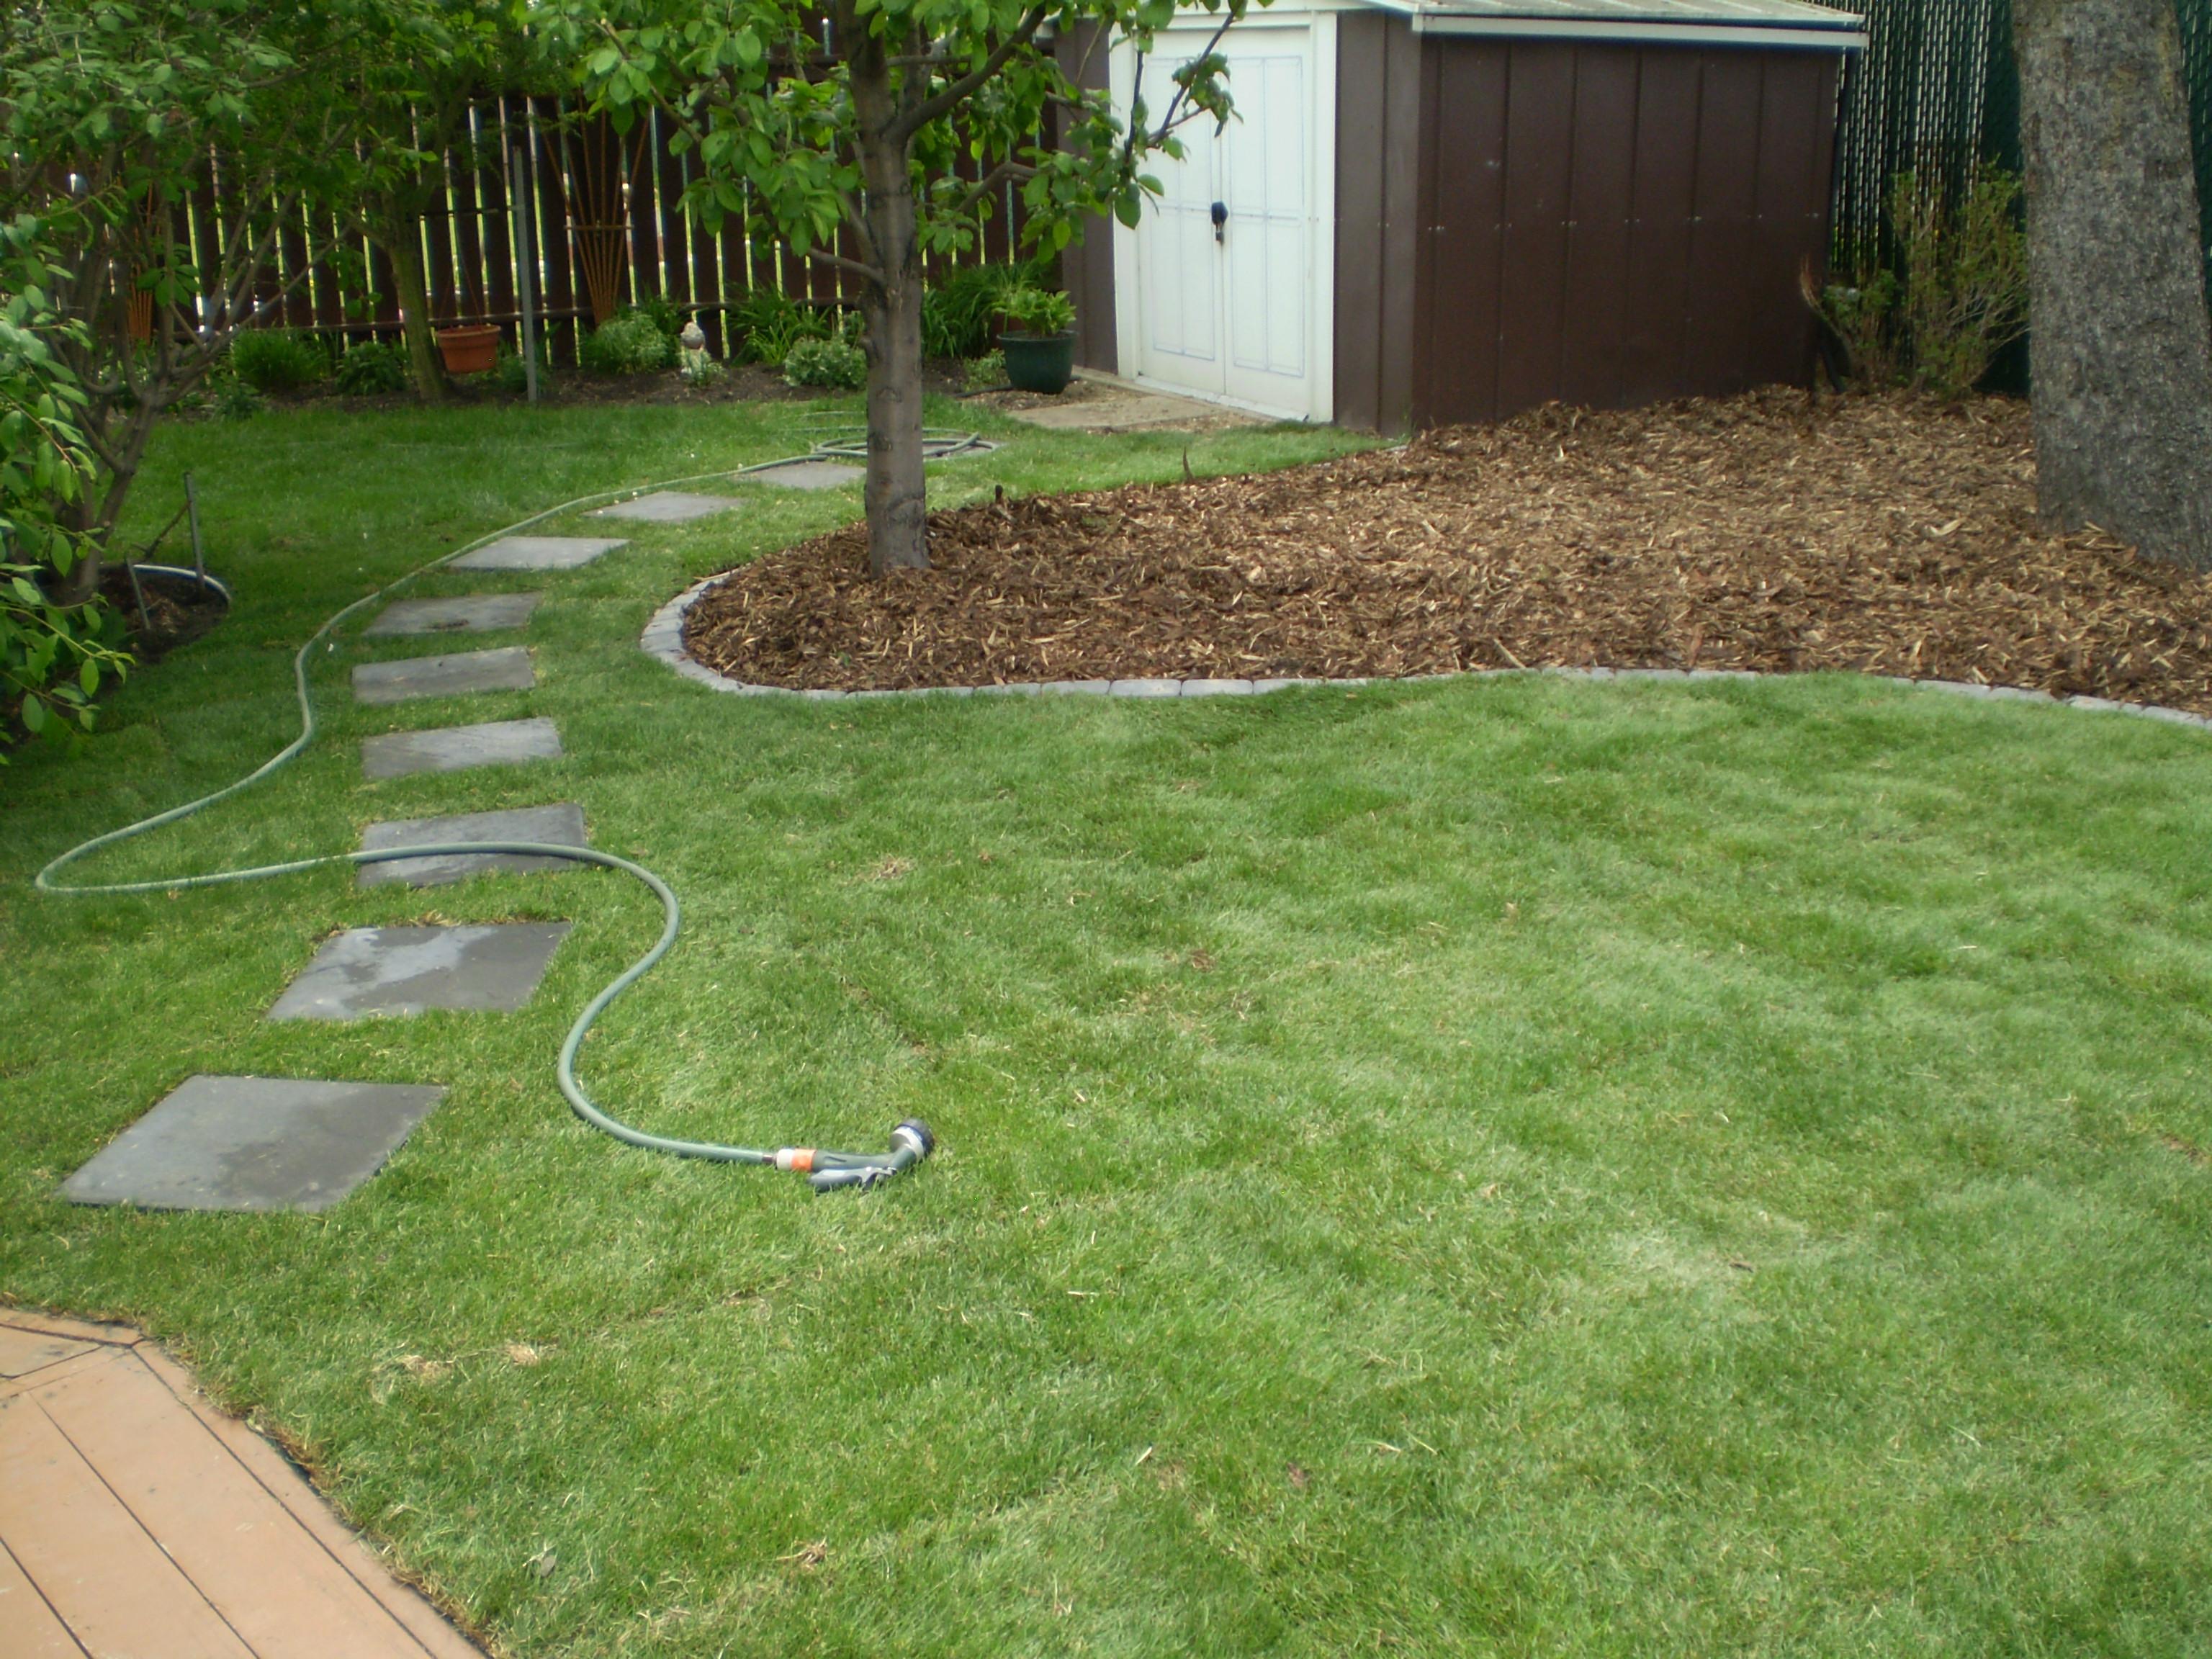 Hyams Landscaping And Garden Center : P whitemud landscaping and garden center edmonton